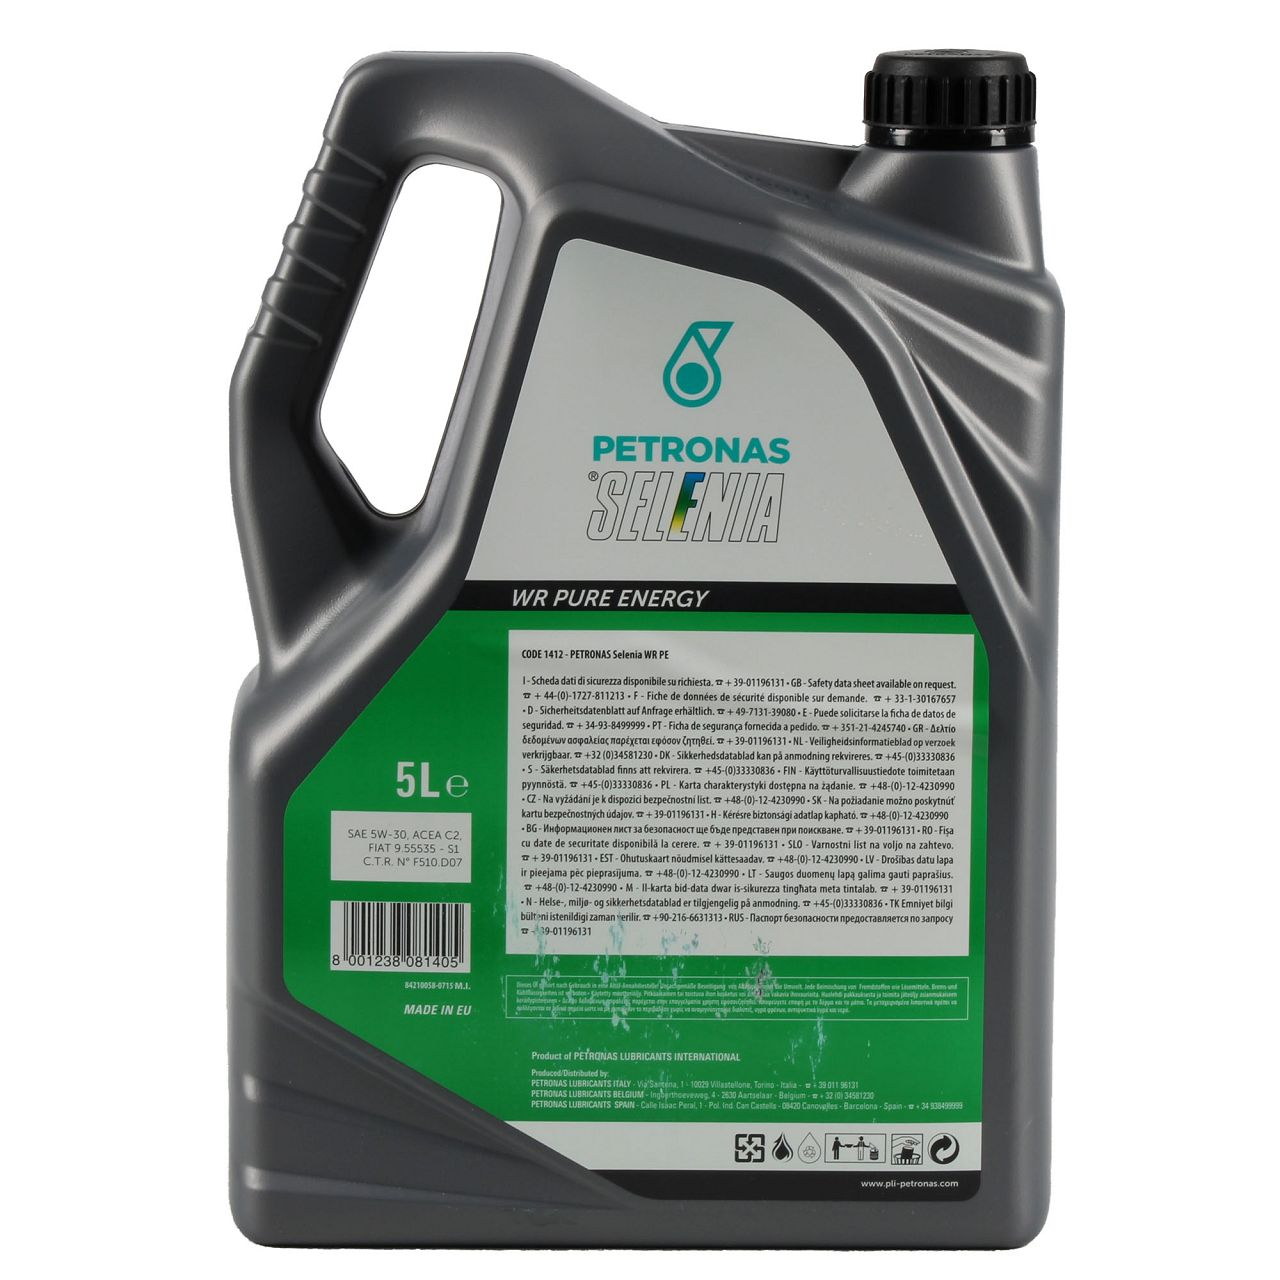 PETRONAS SELENIA Motoröl Öl WR PURE ENERGY 5W30 5W-30 Fiat 9.55535-S1 - 5 Liter